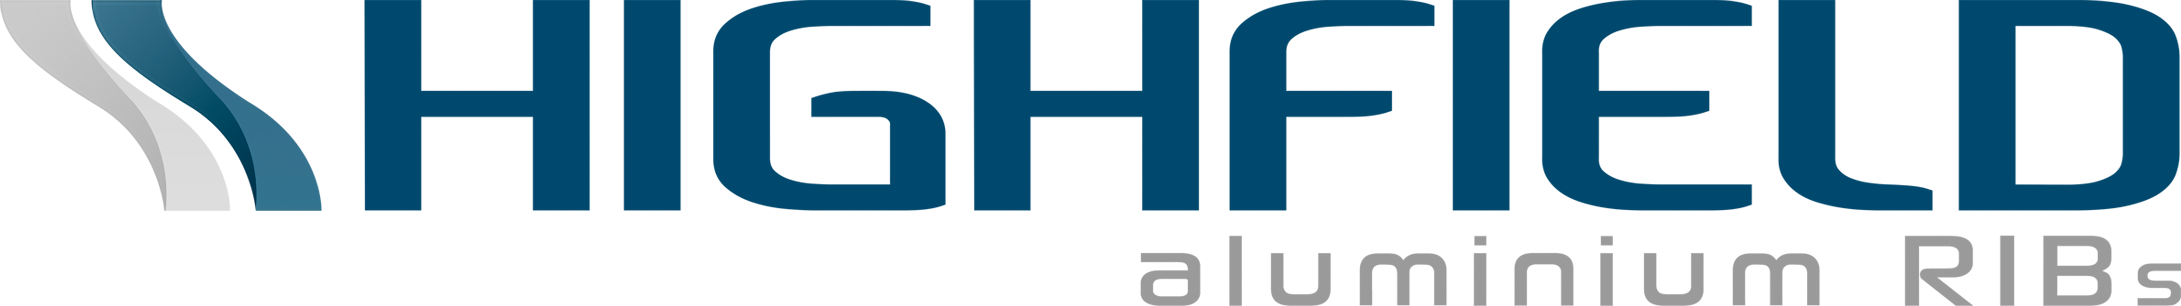 Highfield brand logo